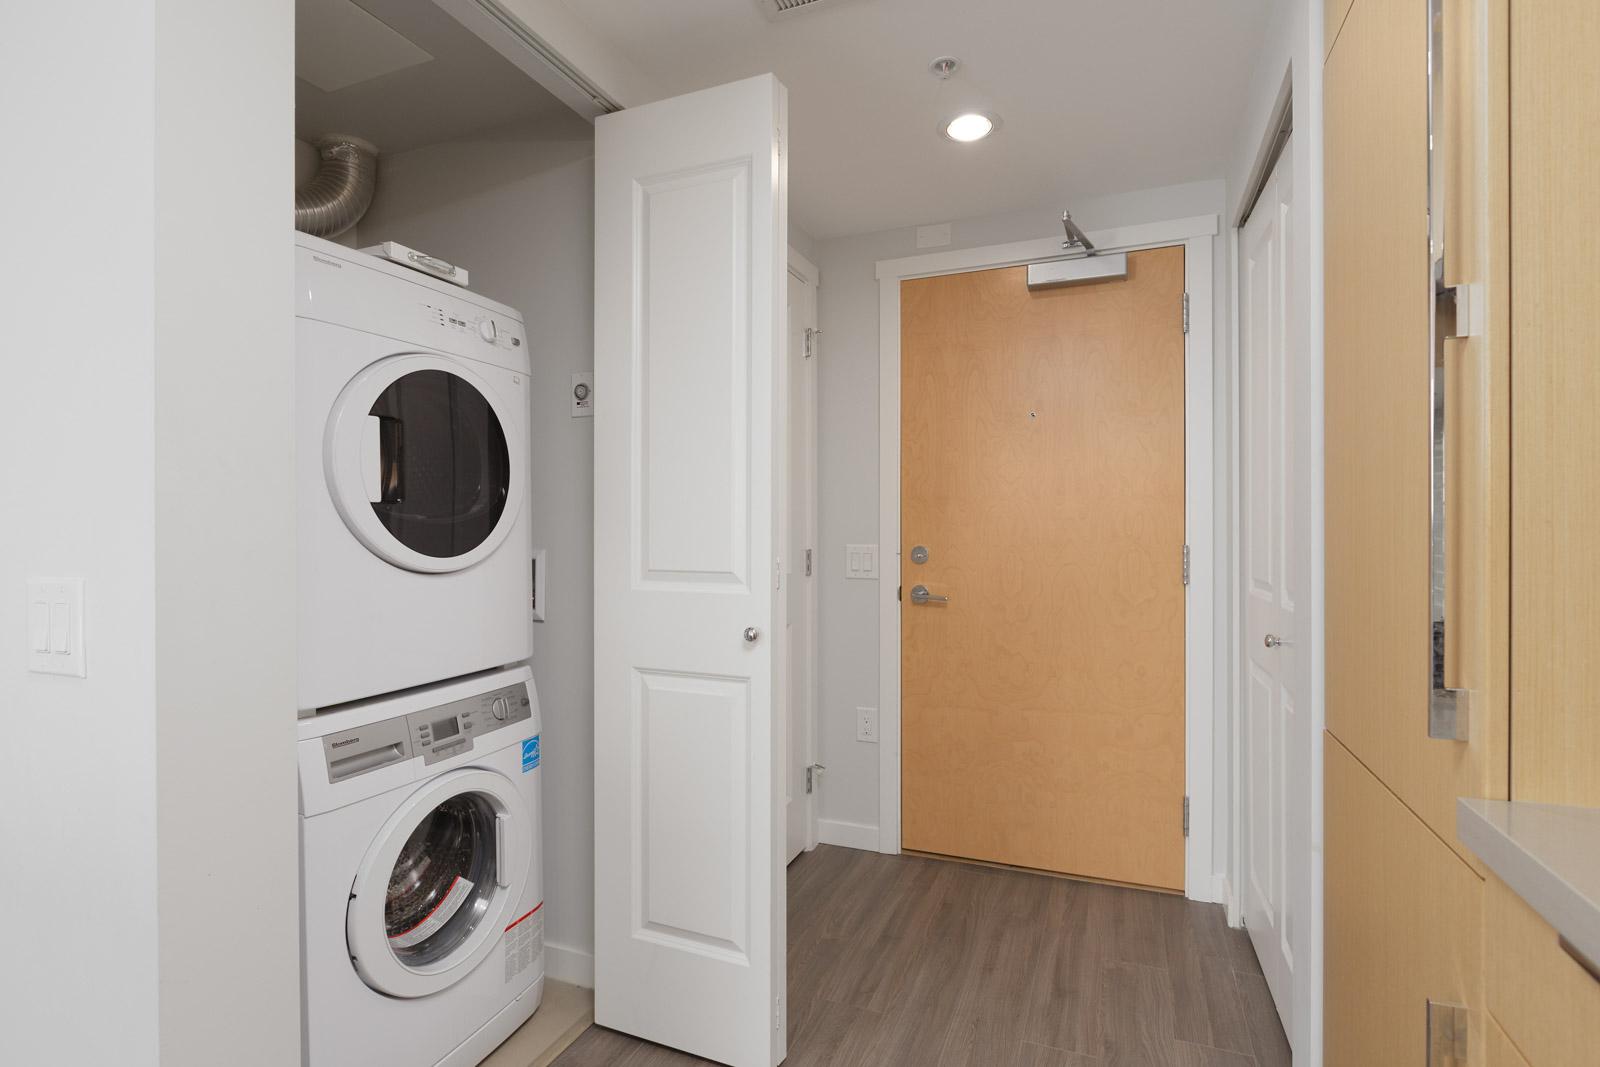 in-suite washer and dryer next to front door